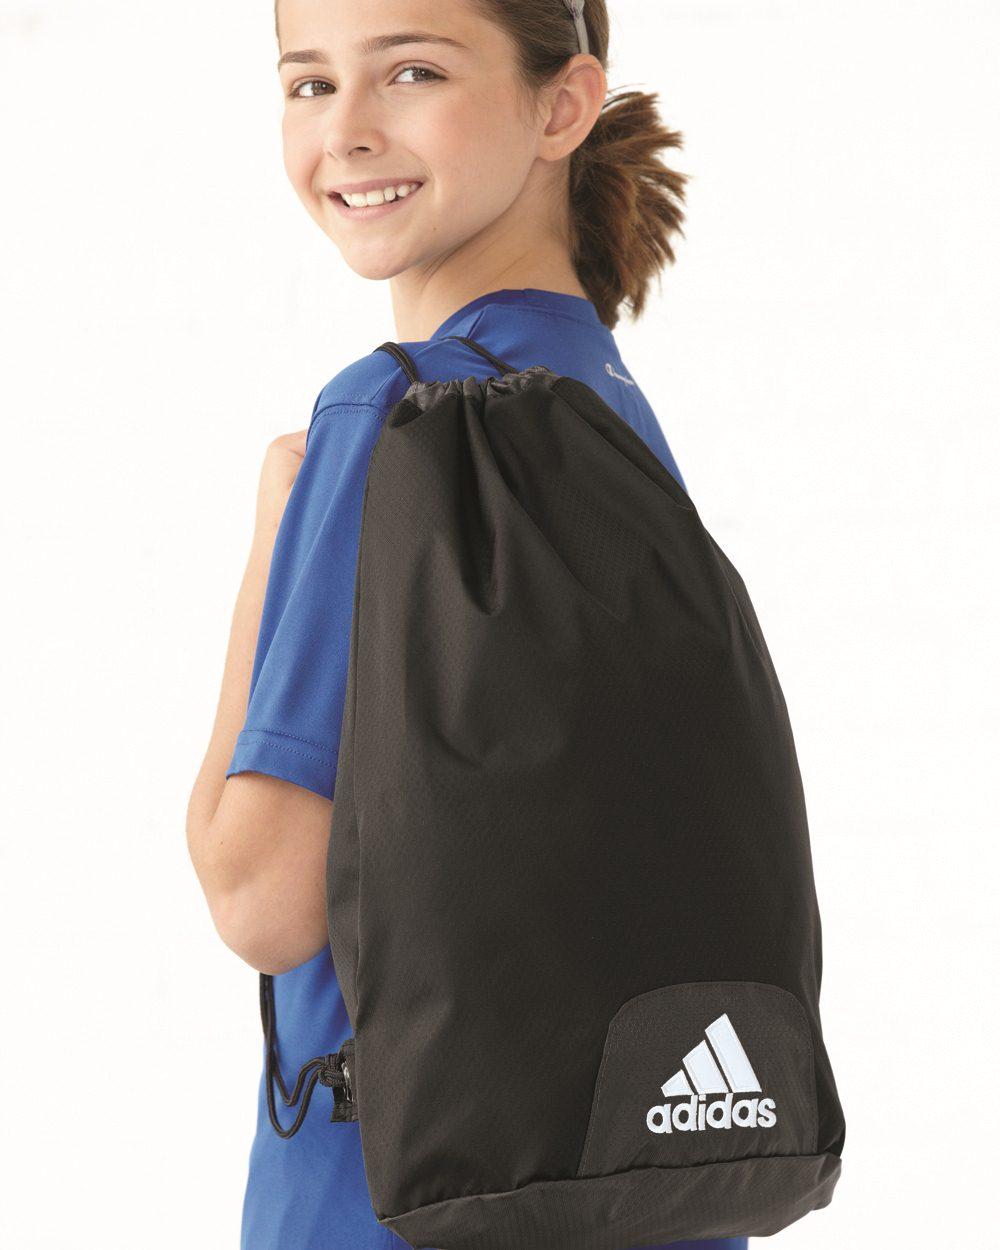 adidas - University Gym Sack